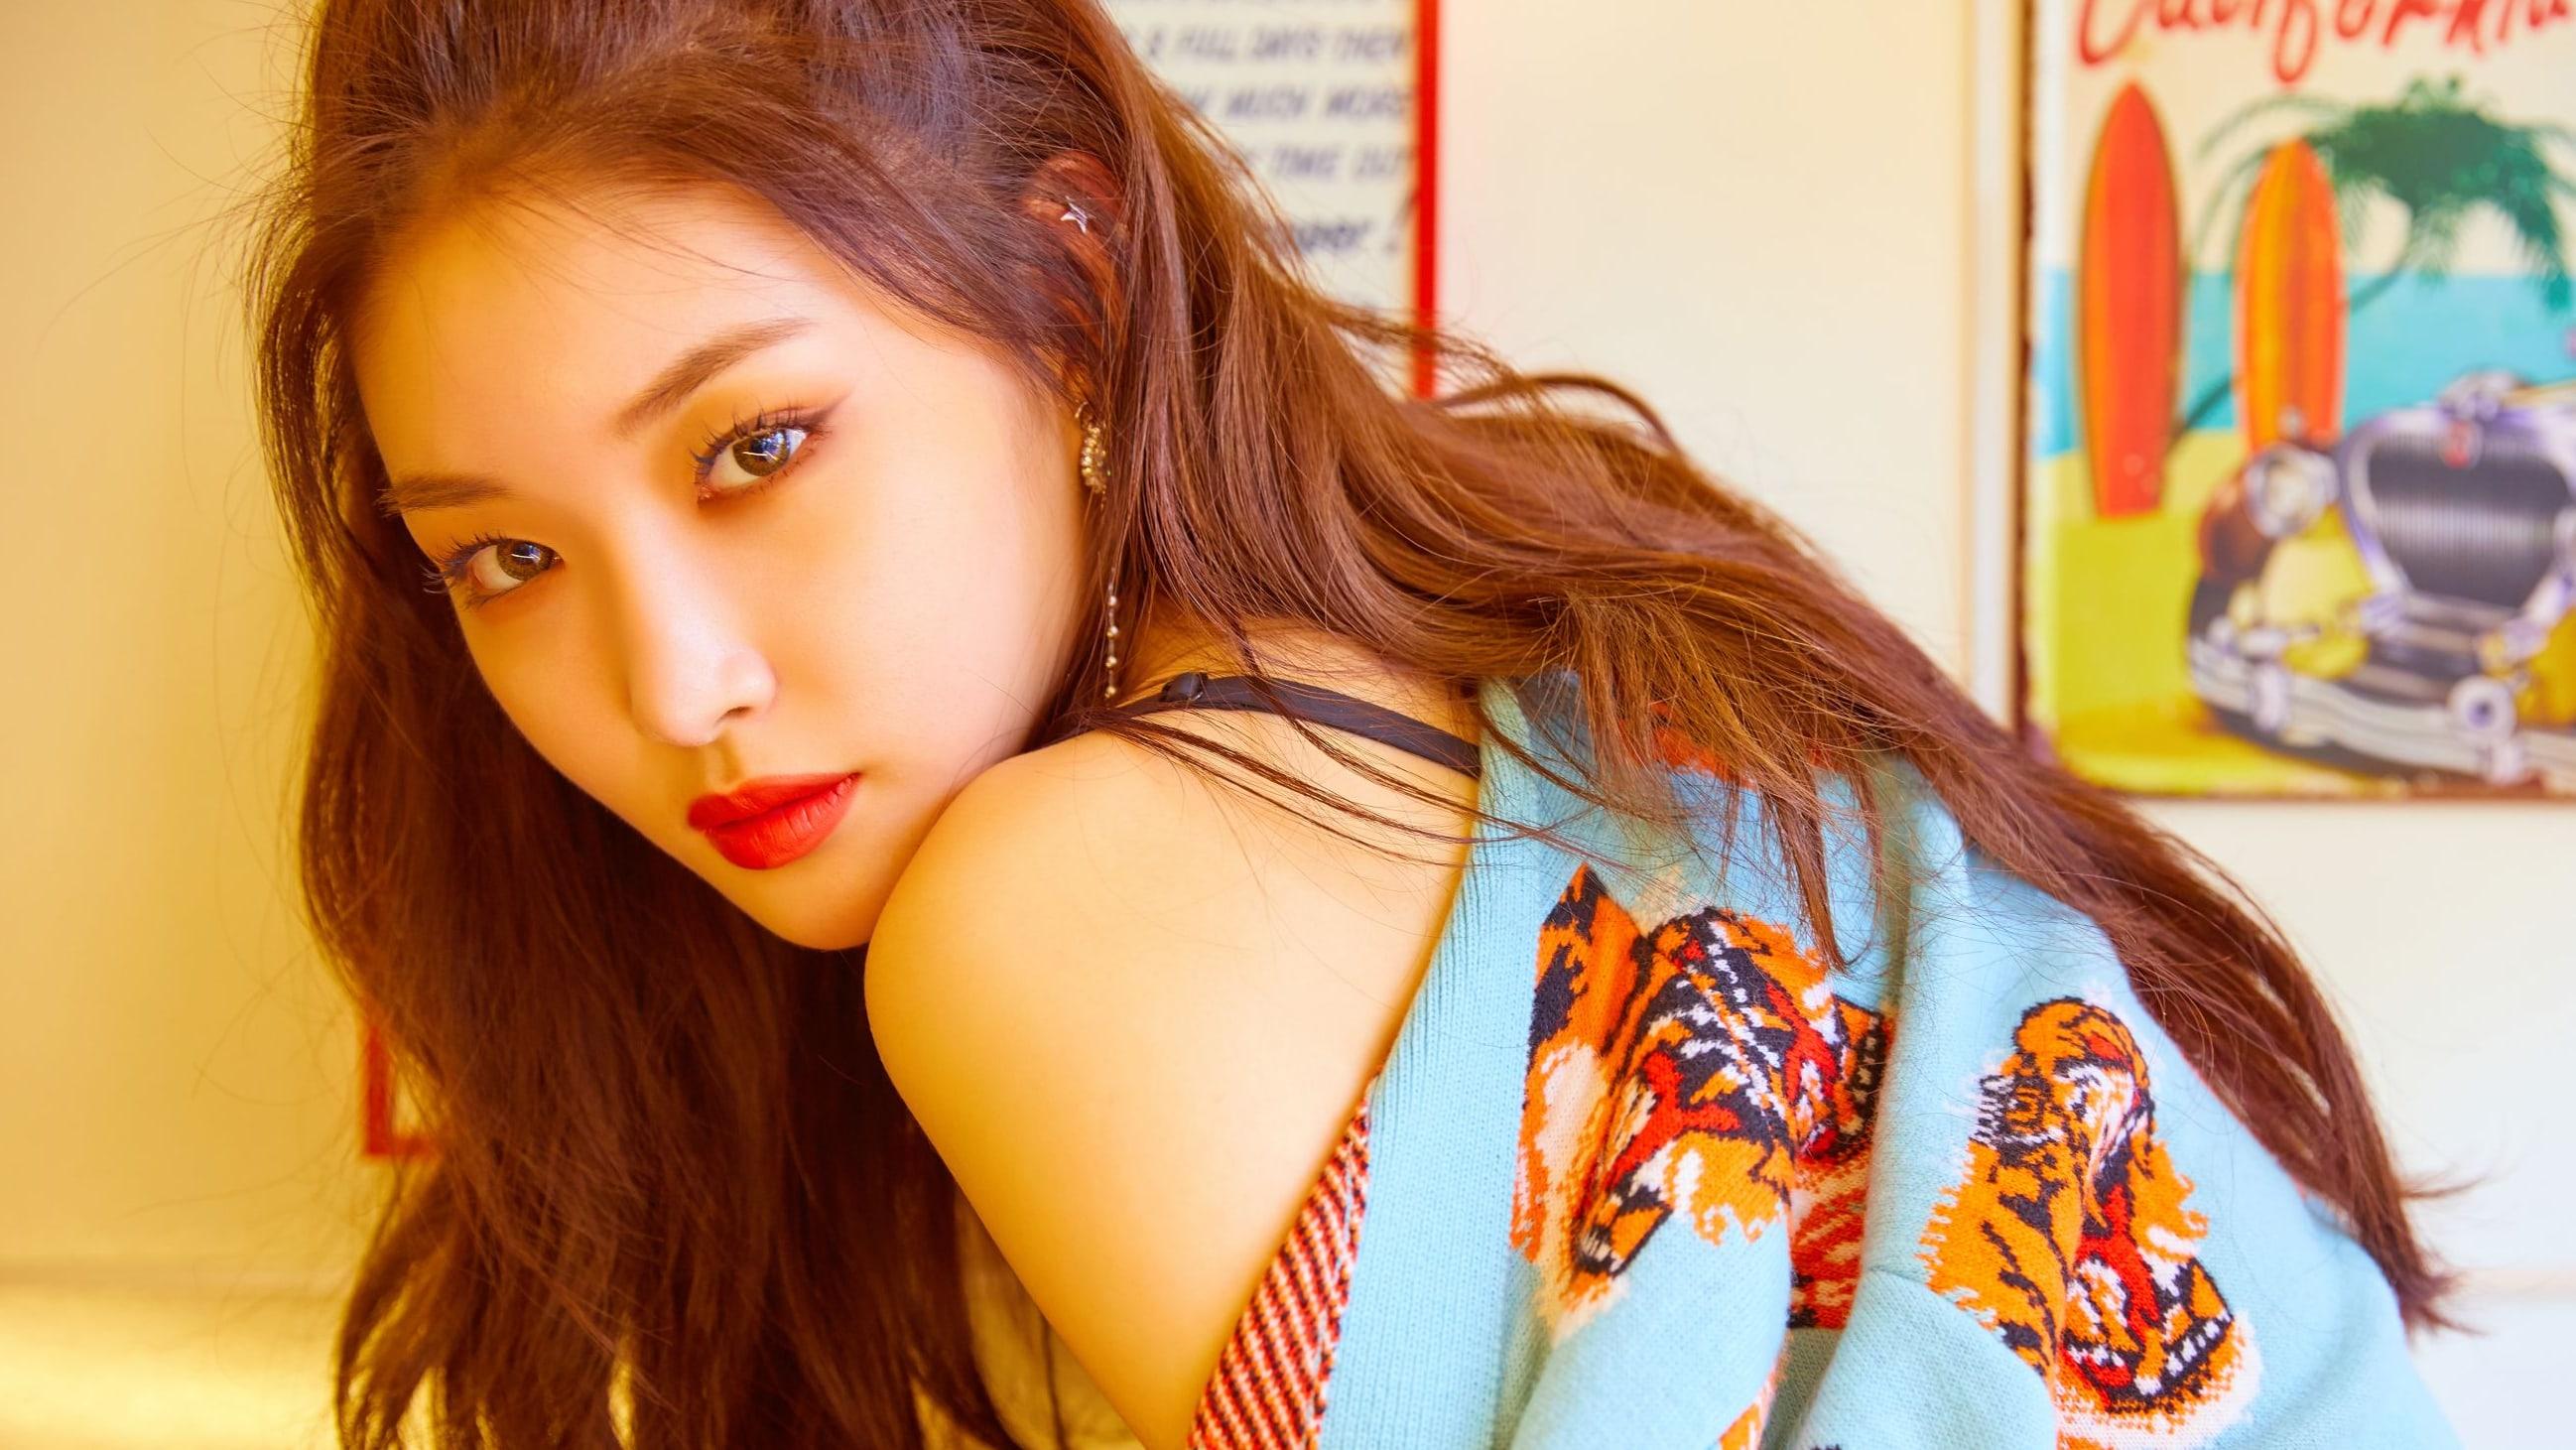 Chungha Reveals She's Never Had An Official Boyfriend